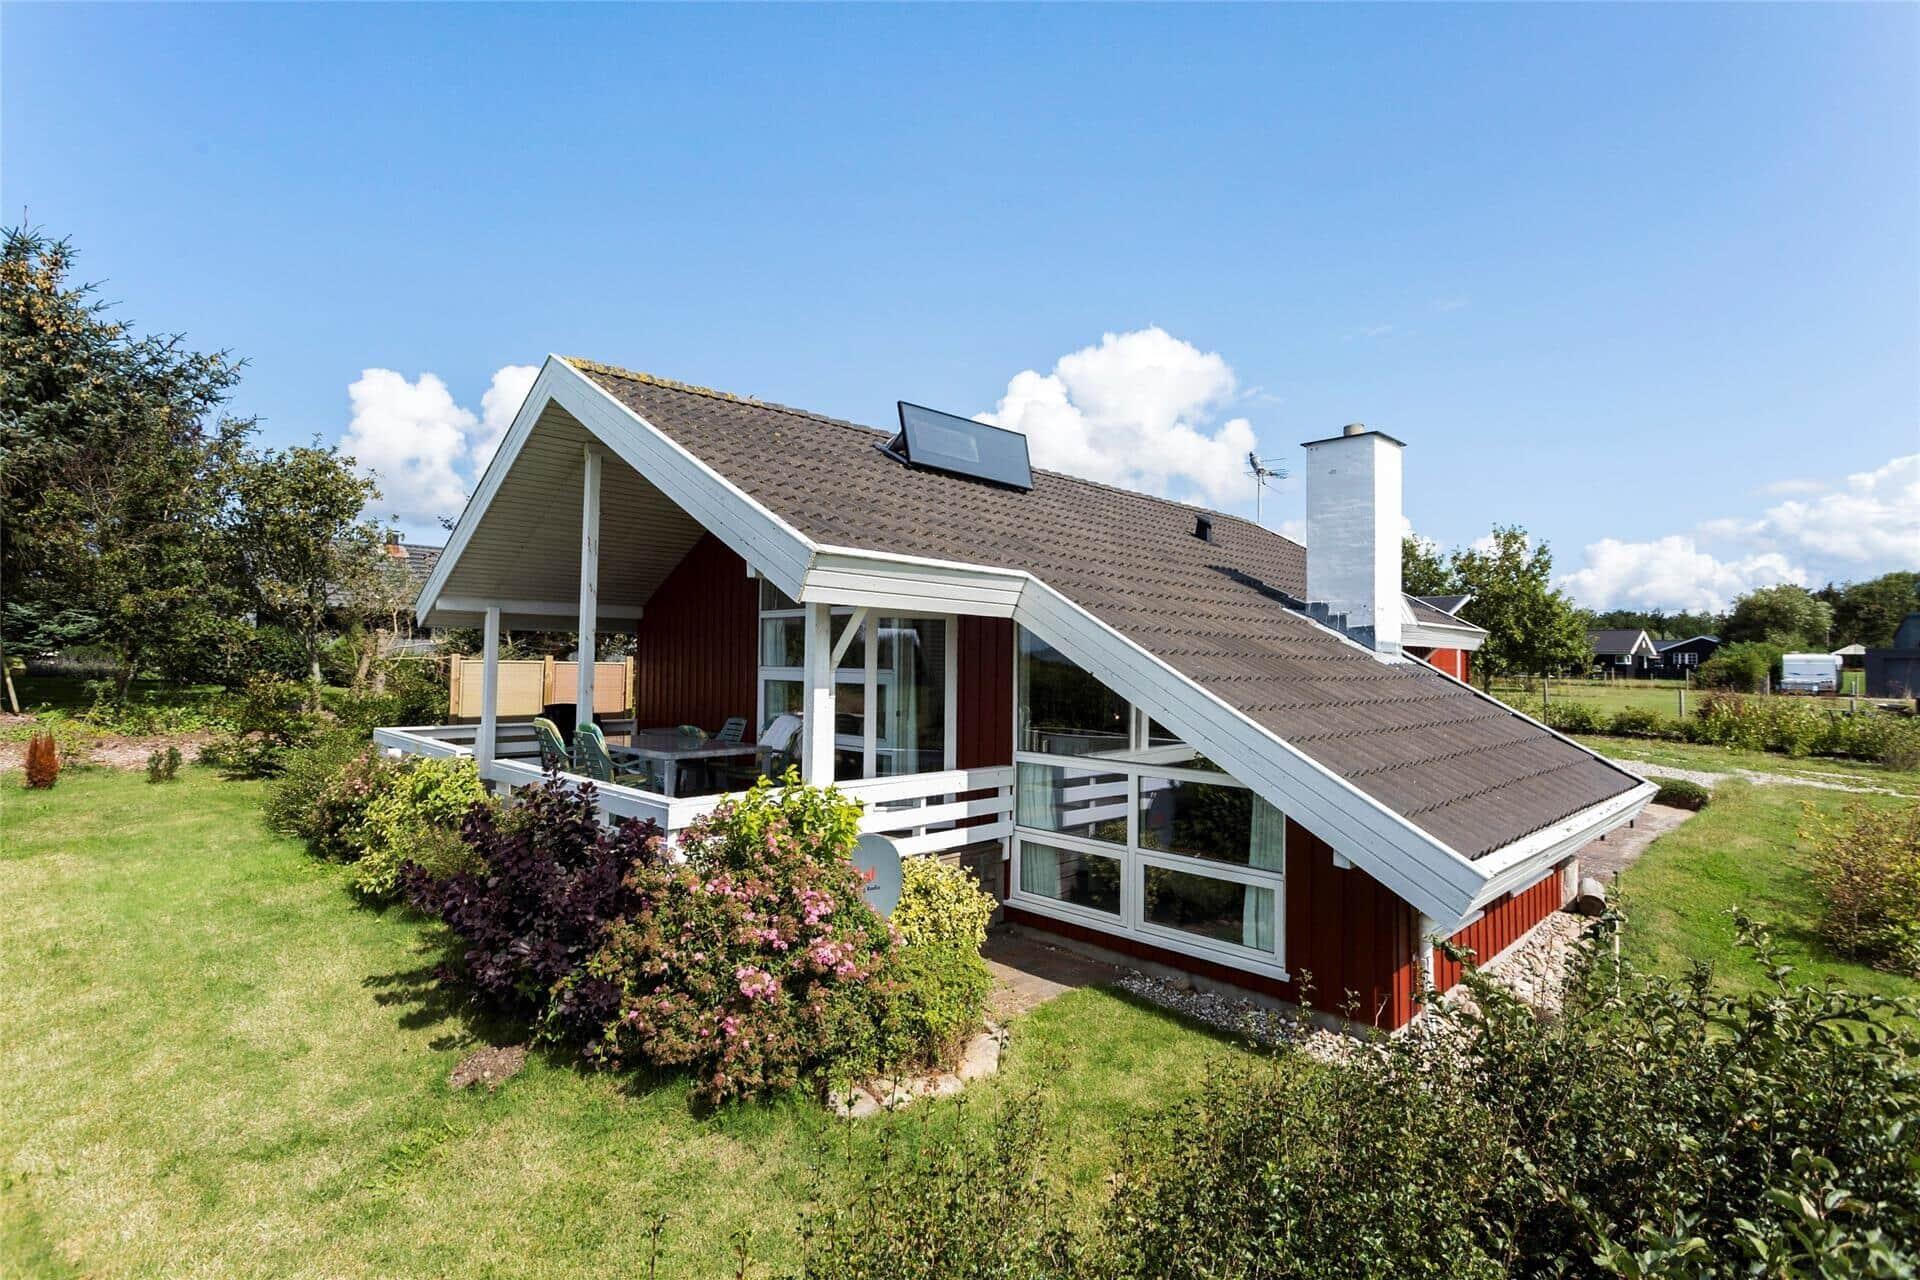 Billede 1-3 Sommerhus L16098, Kammasvej 29, DK - 9670 Løgstør